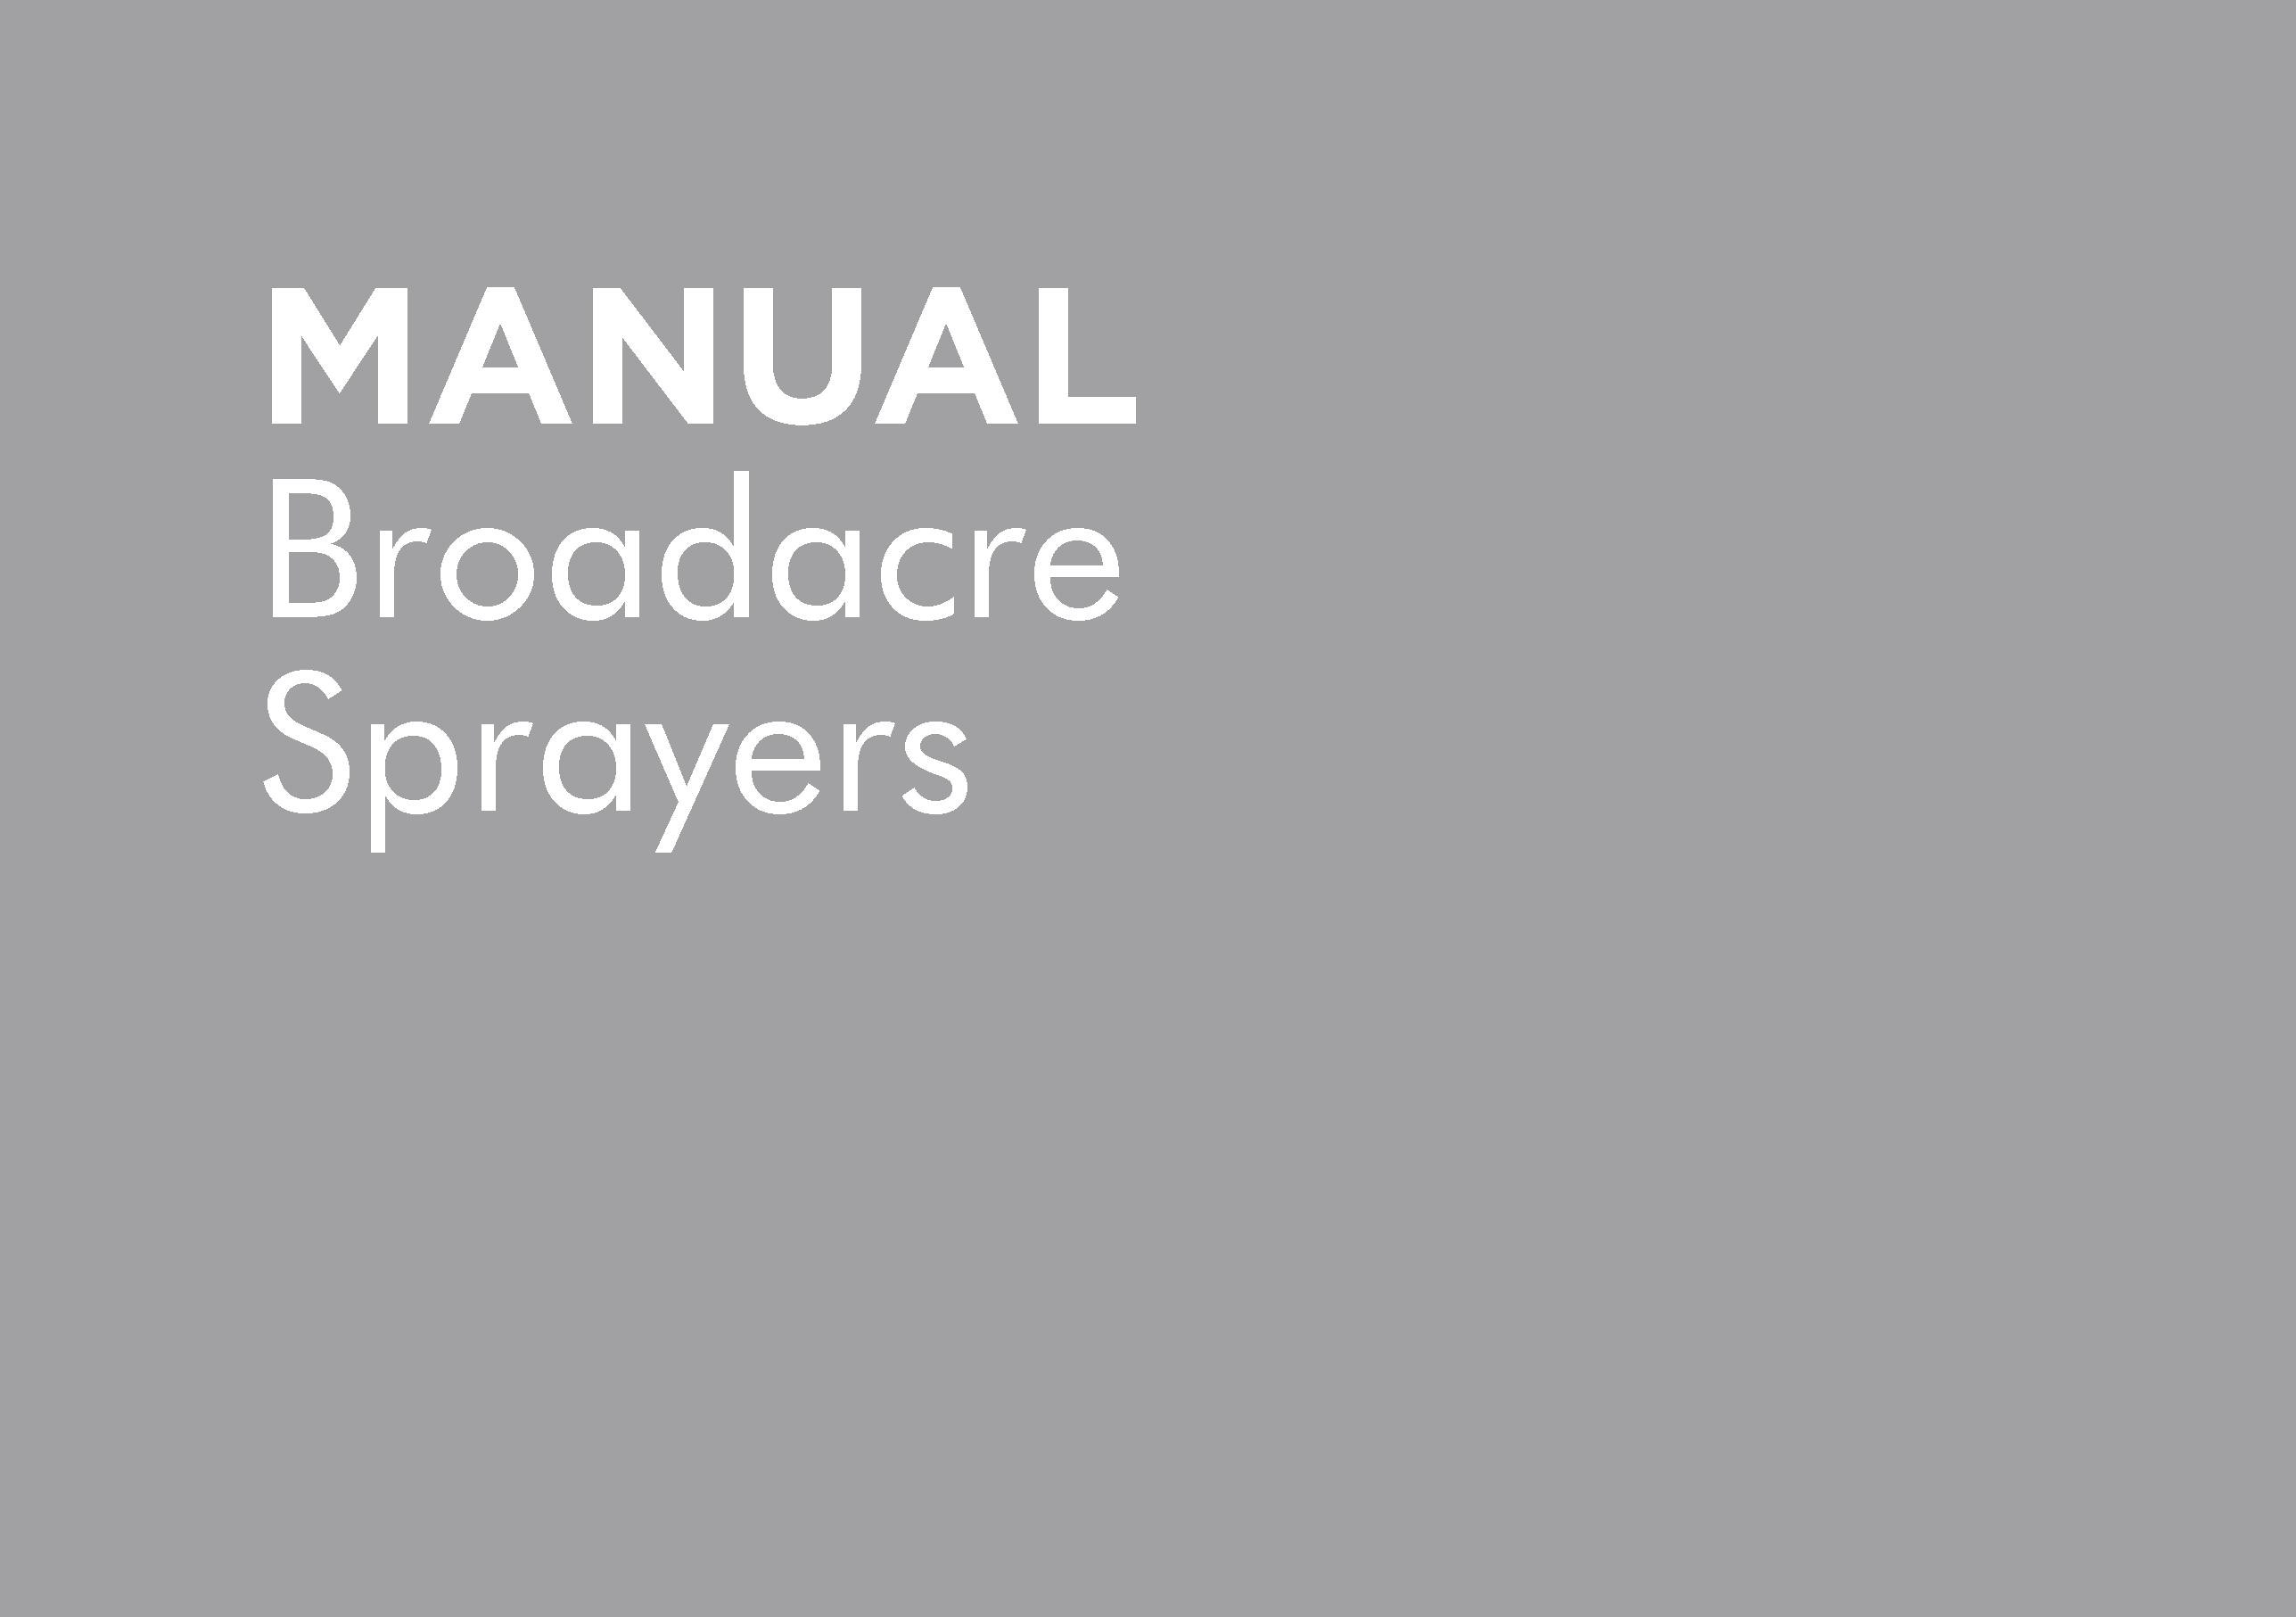 GP-POMBA001108 – SUPPLEMENT BROADACRE SPRAYERS REV4